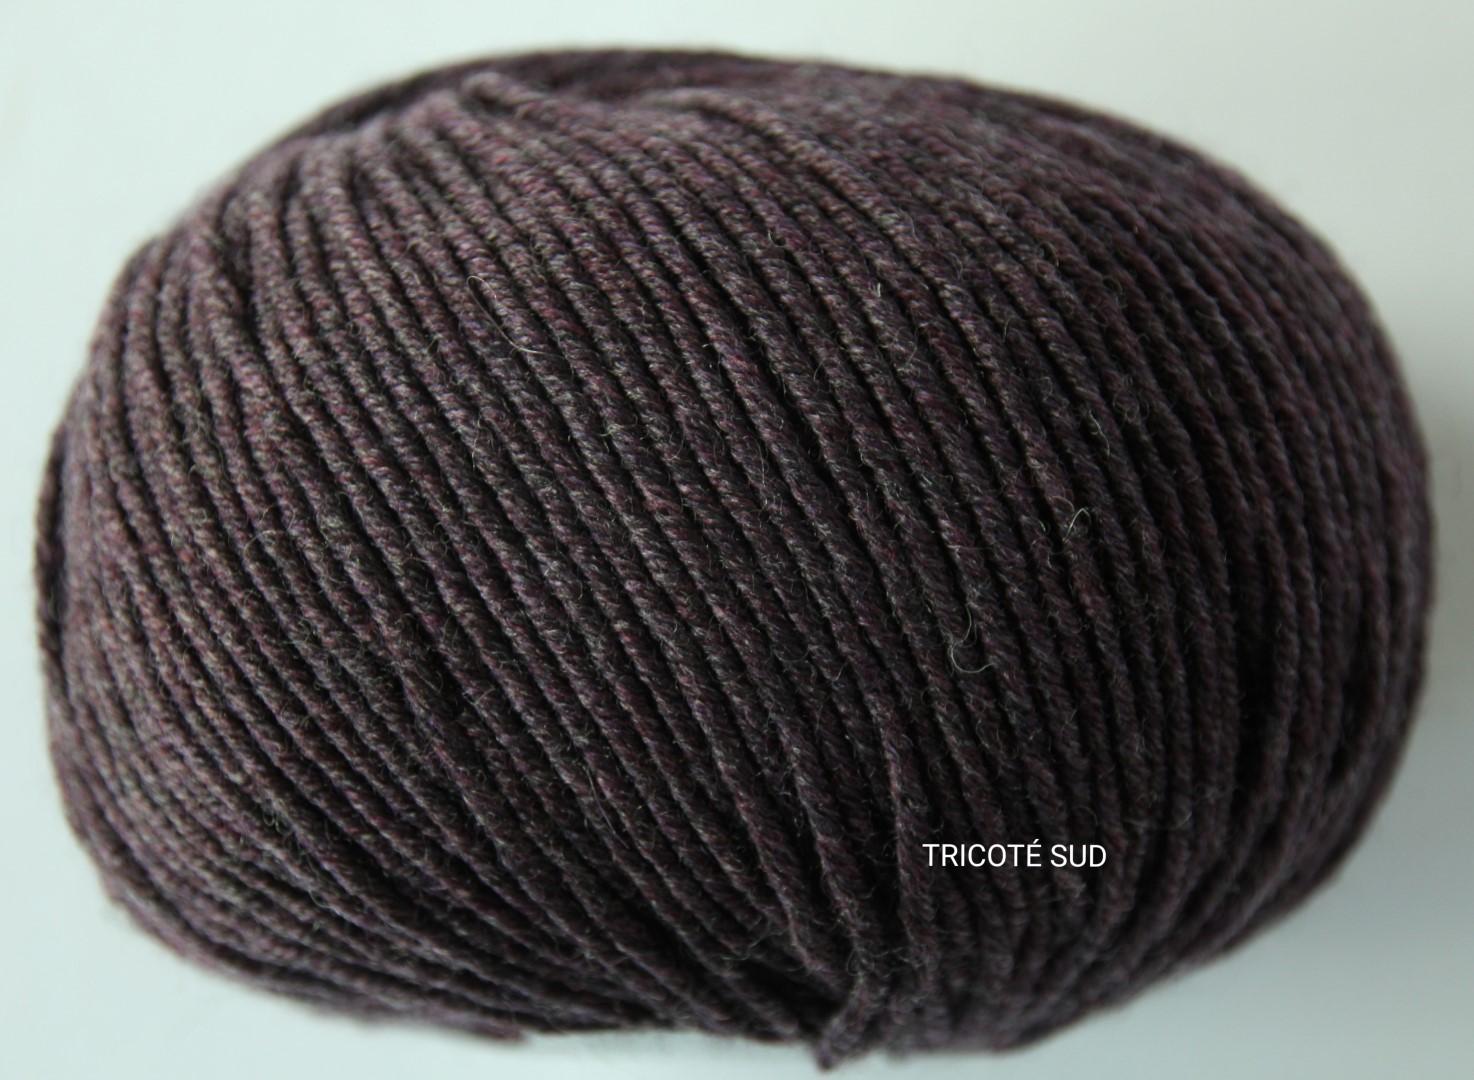 MERINO 120 COLORIS 480 (2) (Large)